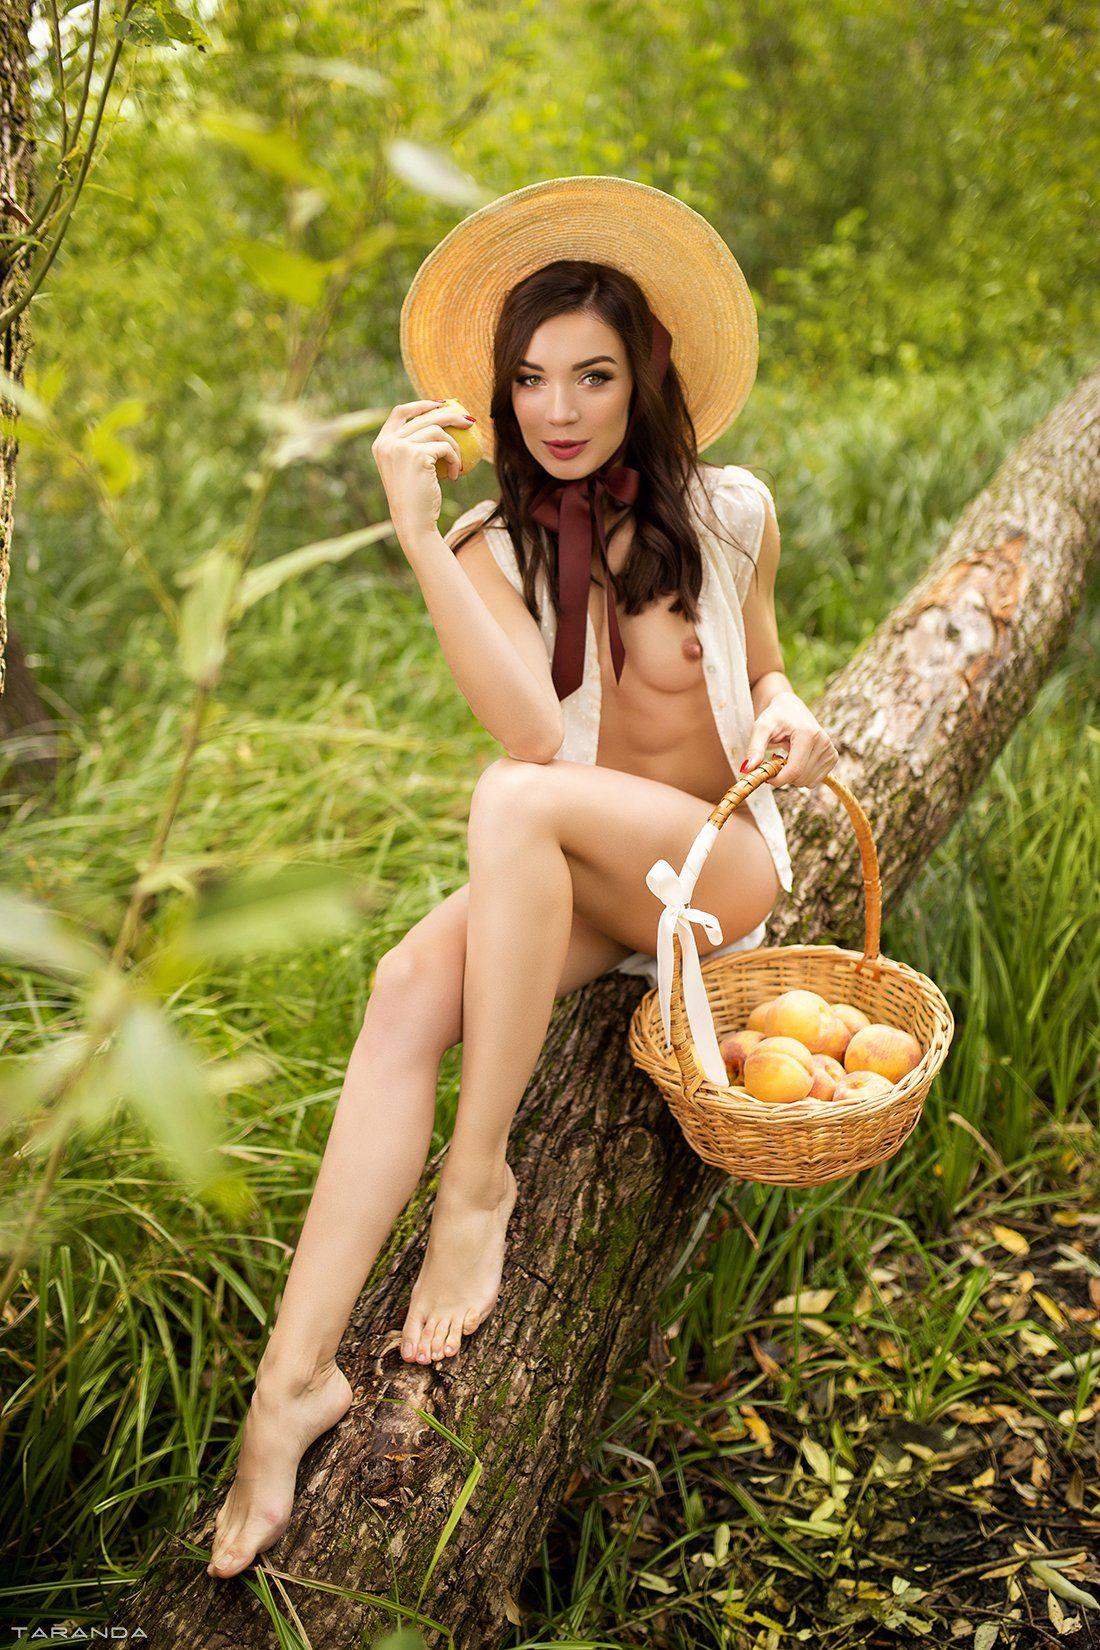 kiev, sexy, ukraine, girl, model, light, colors, retro, peach, nature, portrait, nu, nude, Тарас Таранда